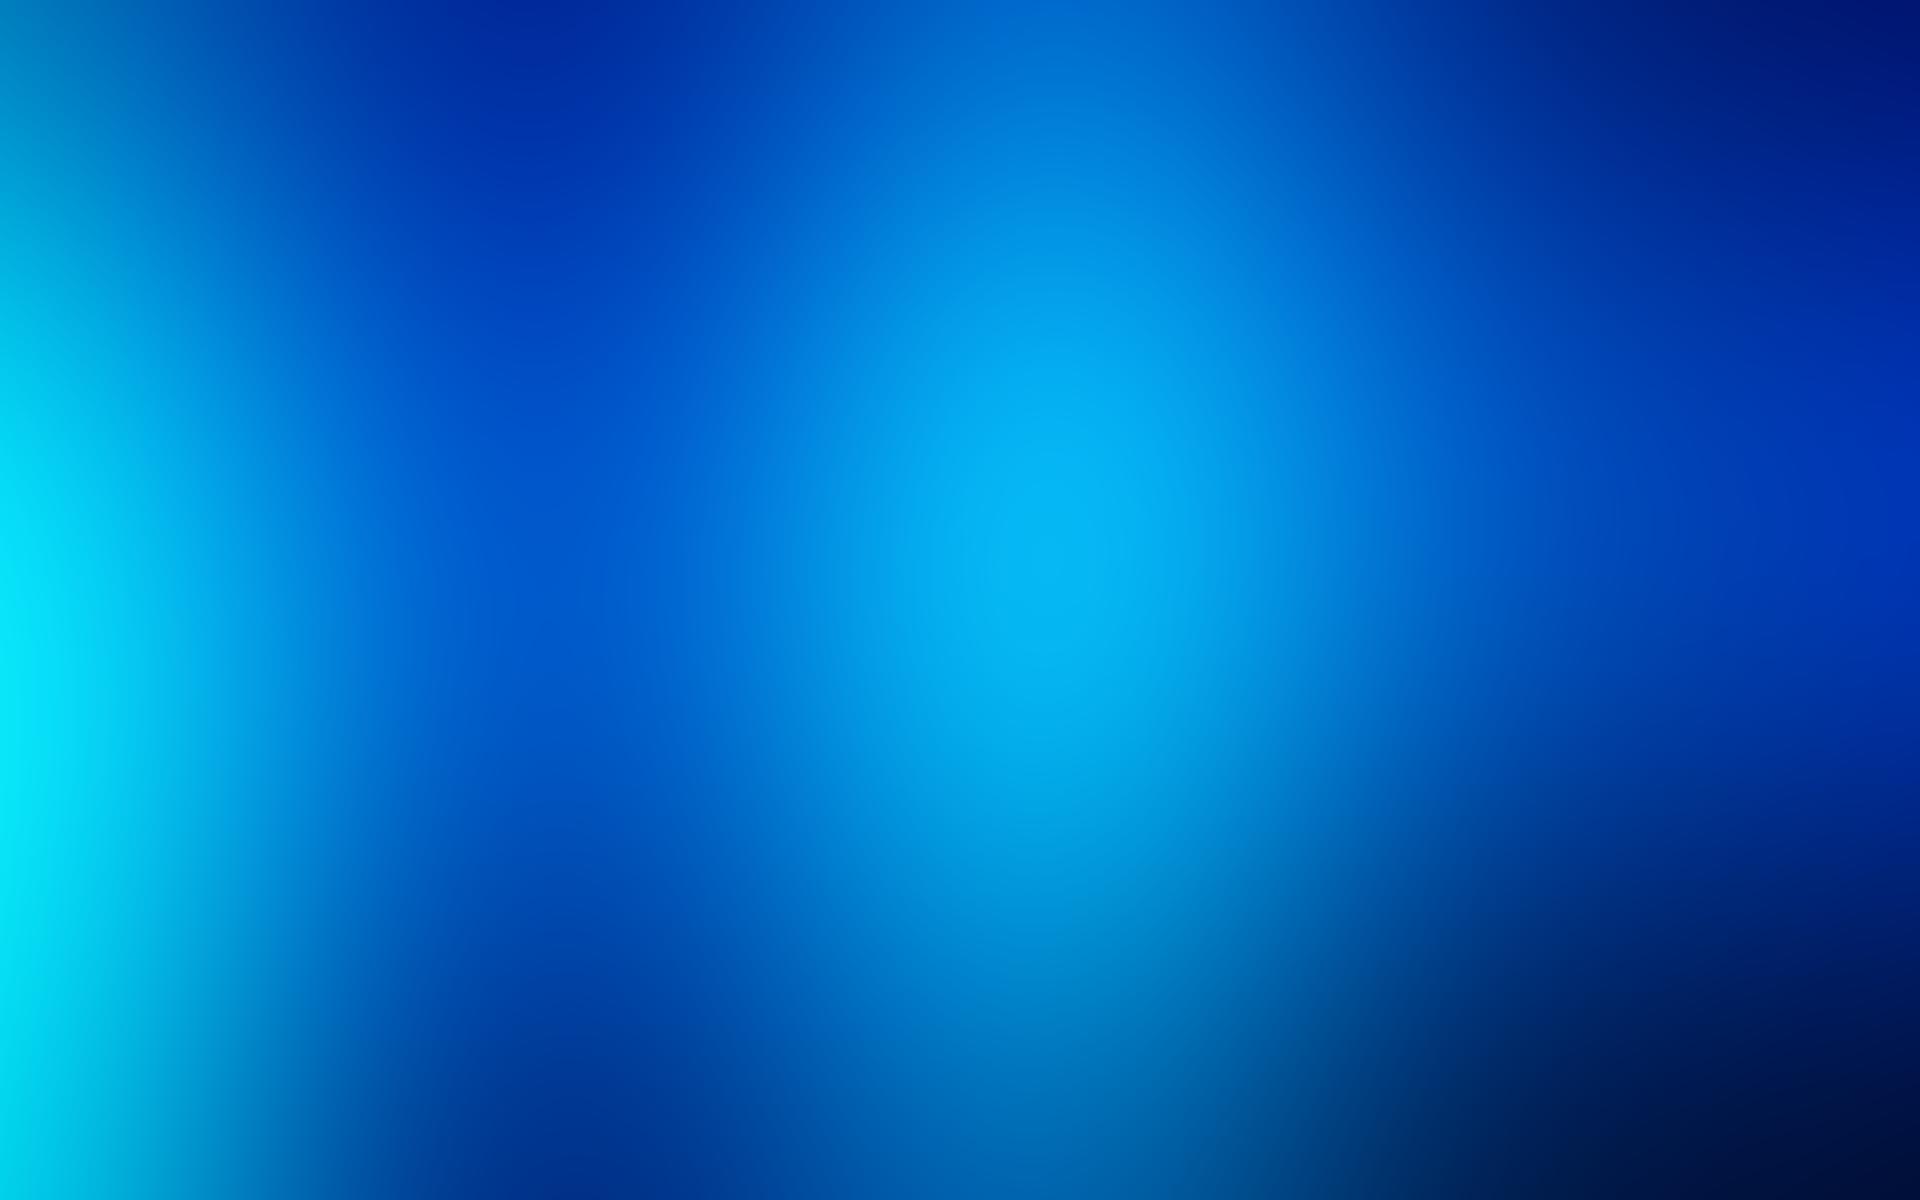 Blue Backgrounds Wallpaper 1920x1200 Blue Backgrounds Gradient 1920x1200